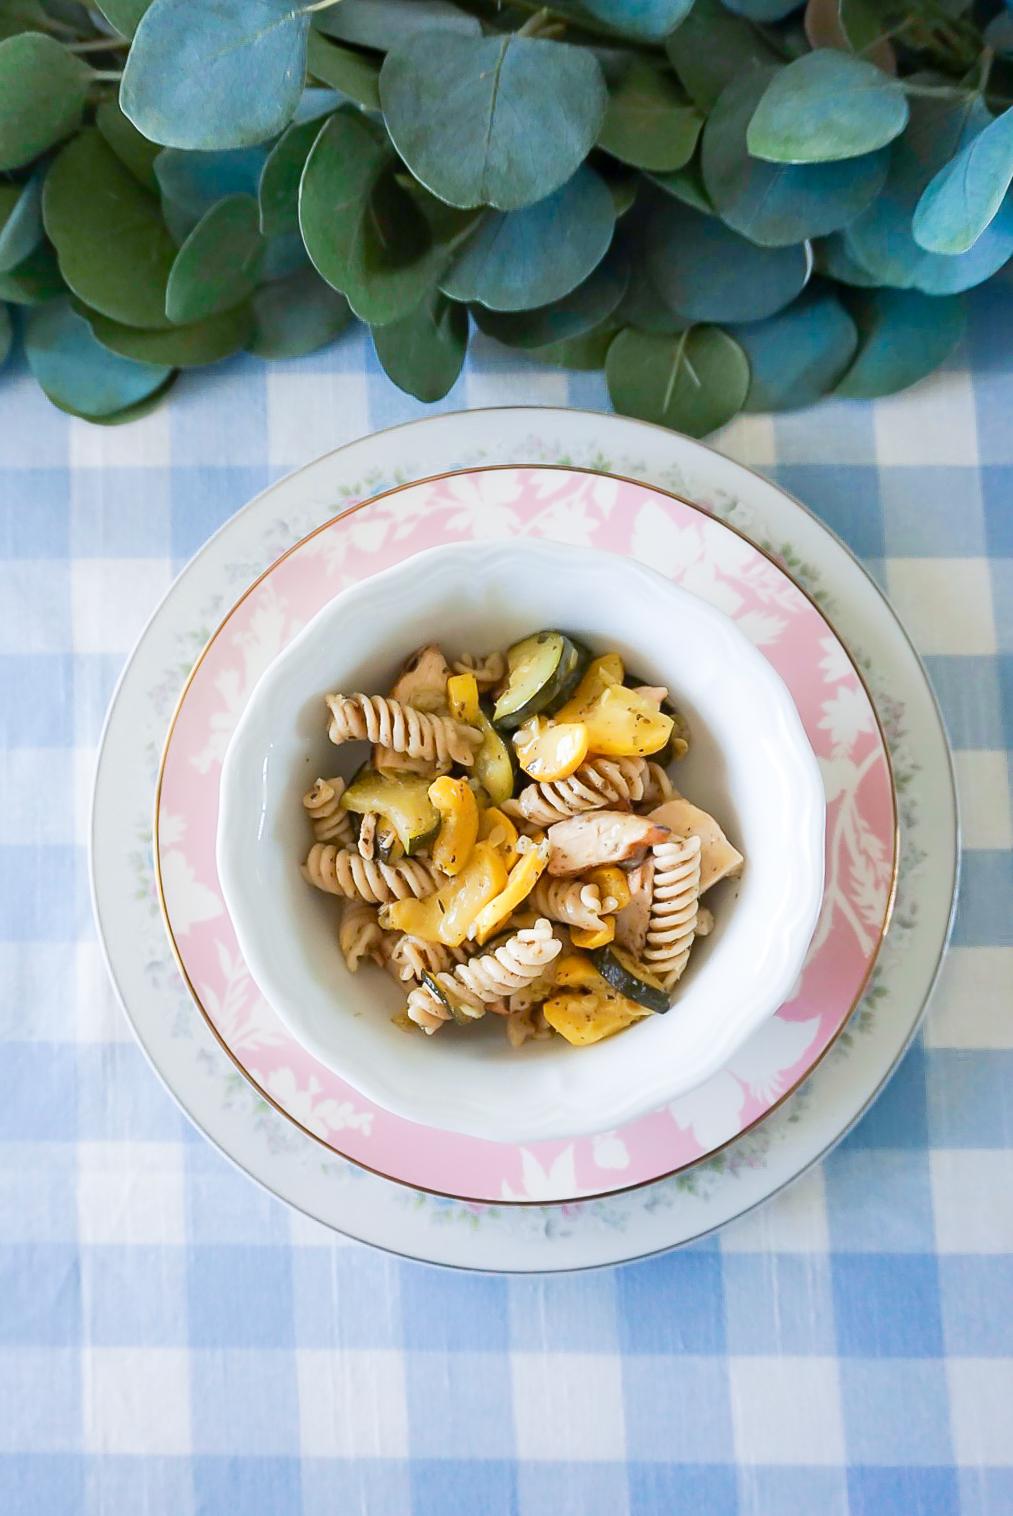 healthy pasta recipe, healthy pasta recipes, brown rice pasta recipe, gluten-free pasta recipe, dairy-free pasta recipe